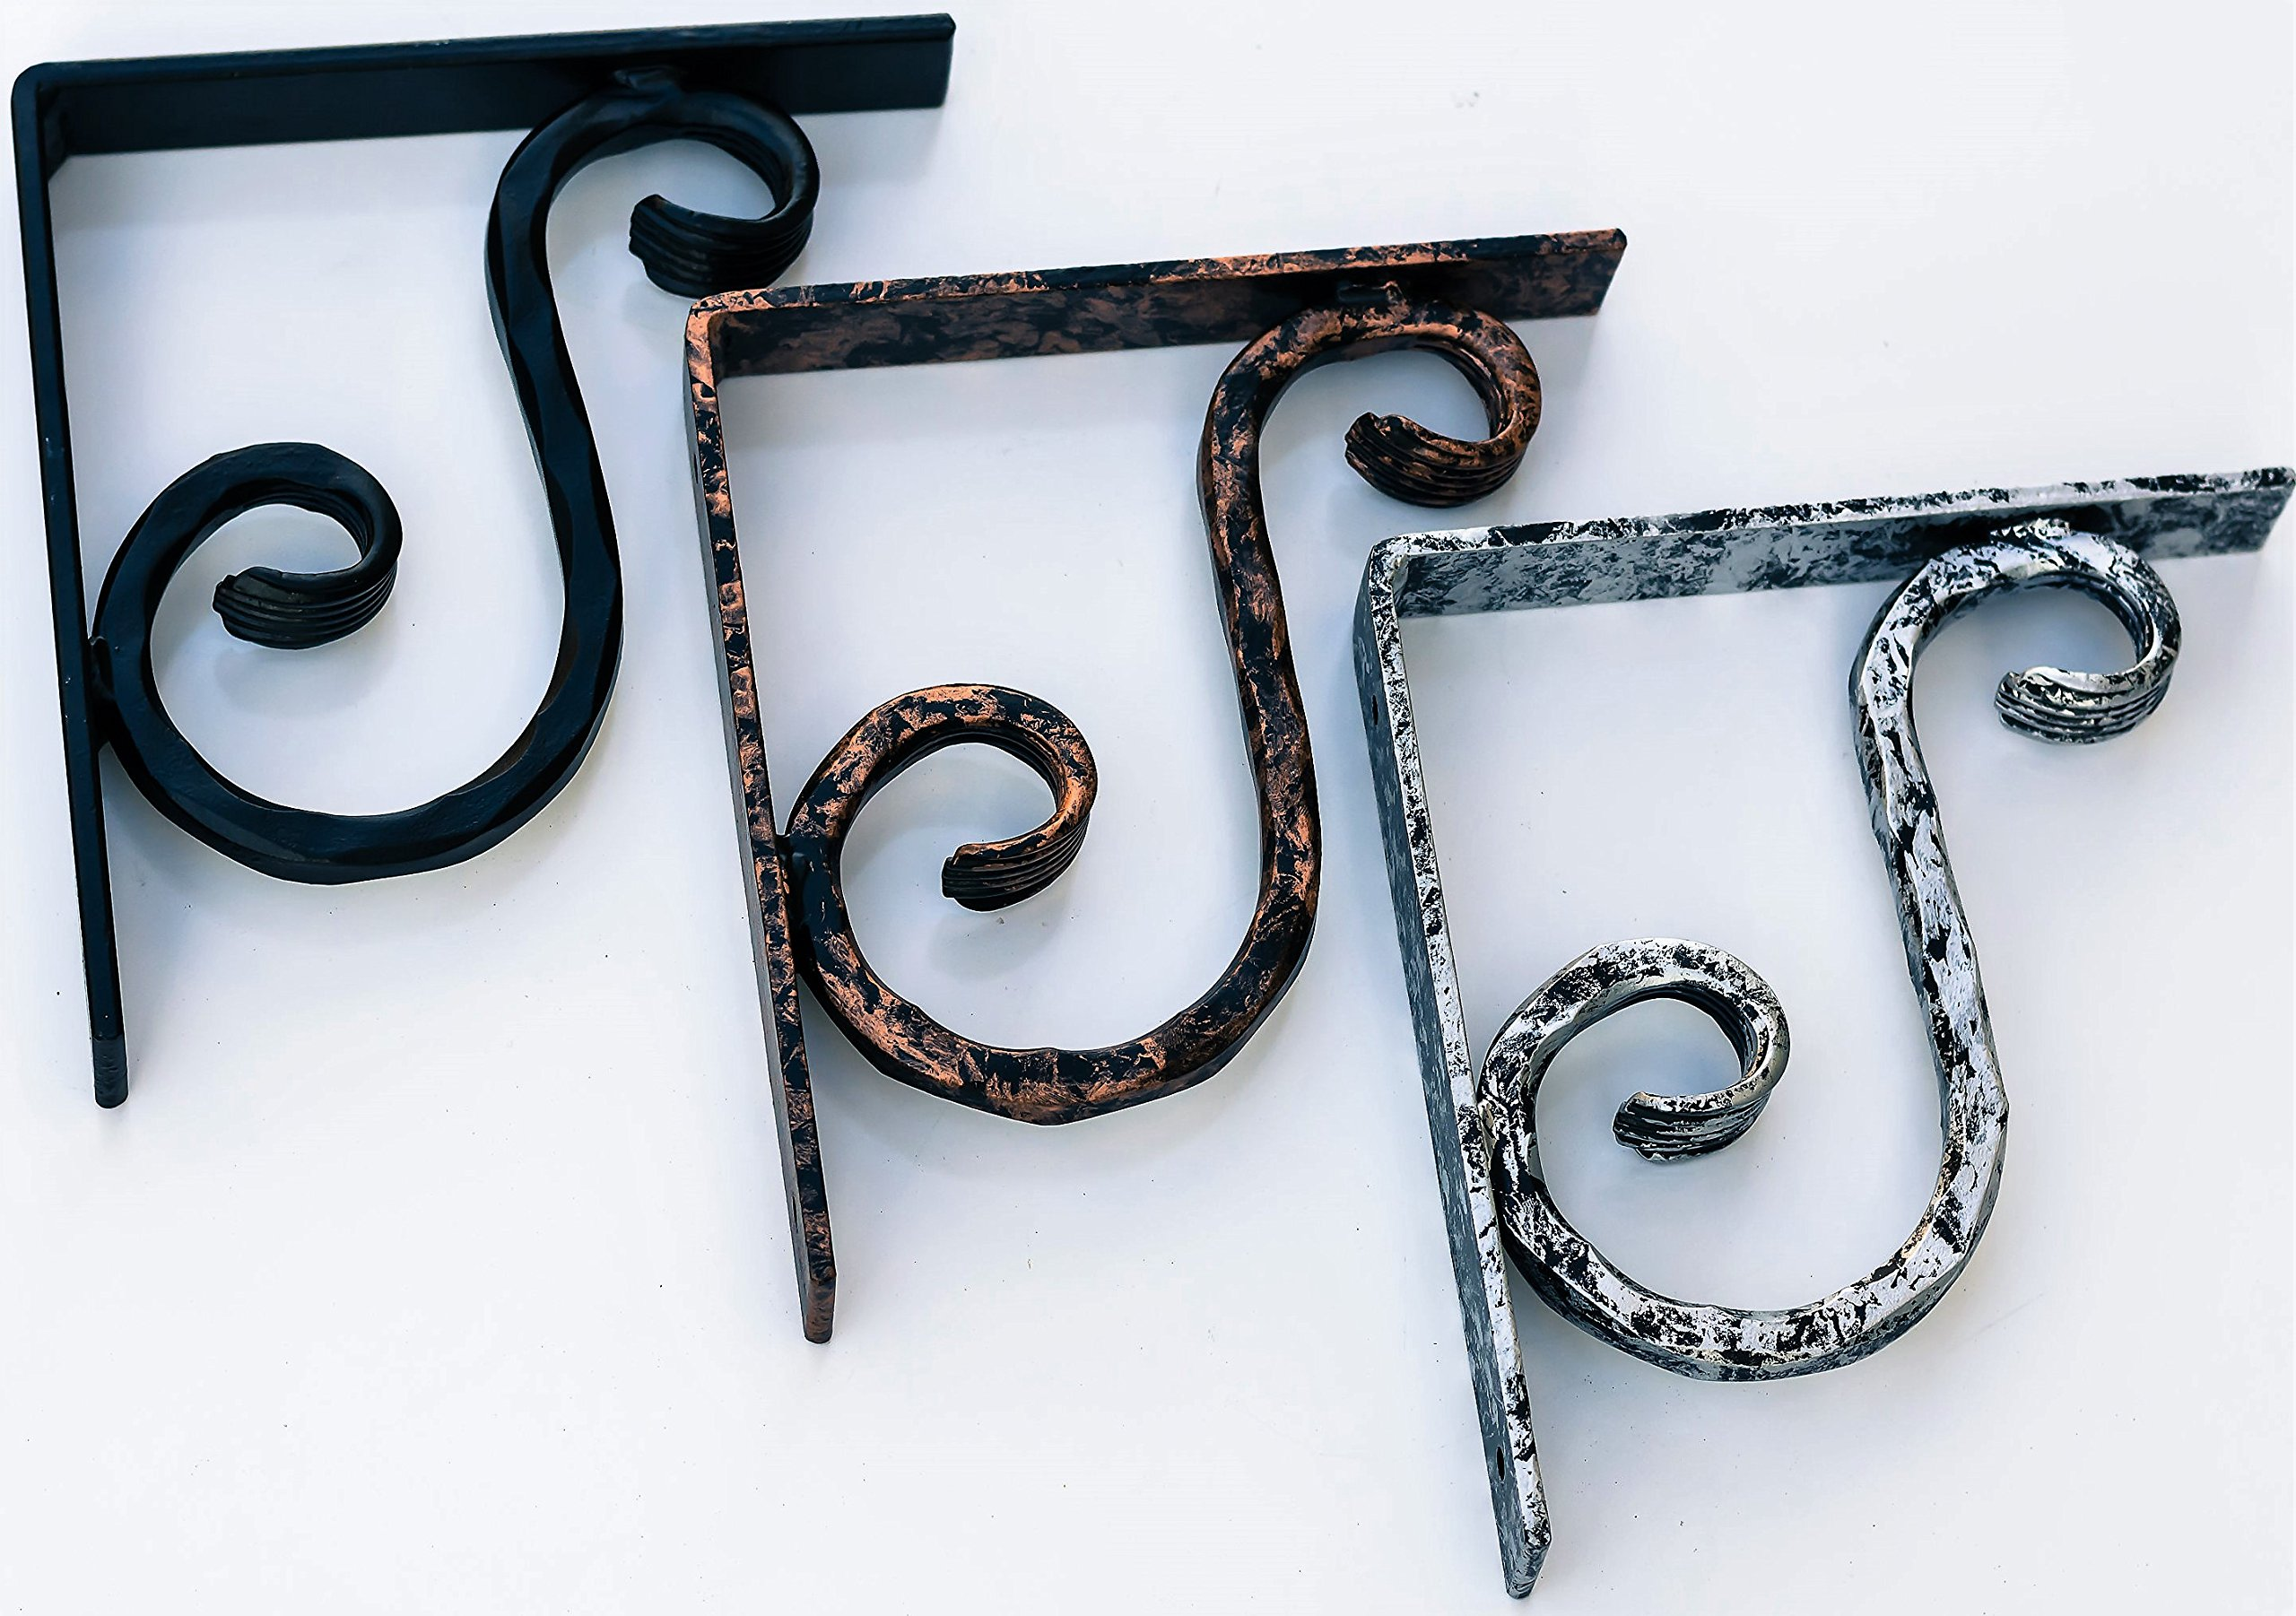 Premiere Decorative Corbels Small Black S Metal Corbel 1pc Decorative Wrought Iron Corbel Countertop Support Corbel Brackets Corbels Decorative Corbel Brackets Countertop Brackets Buy Online In